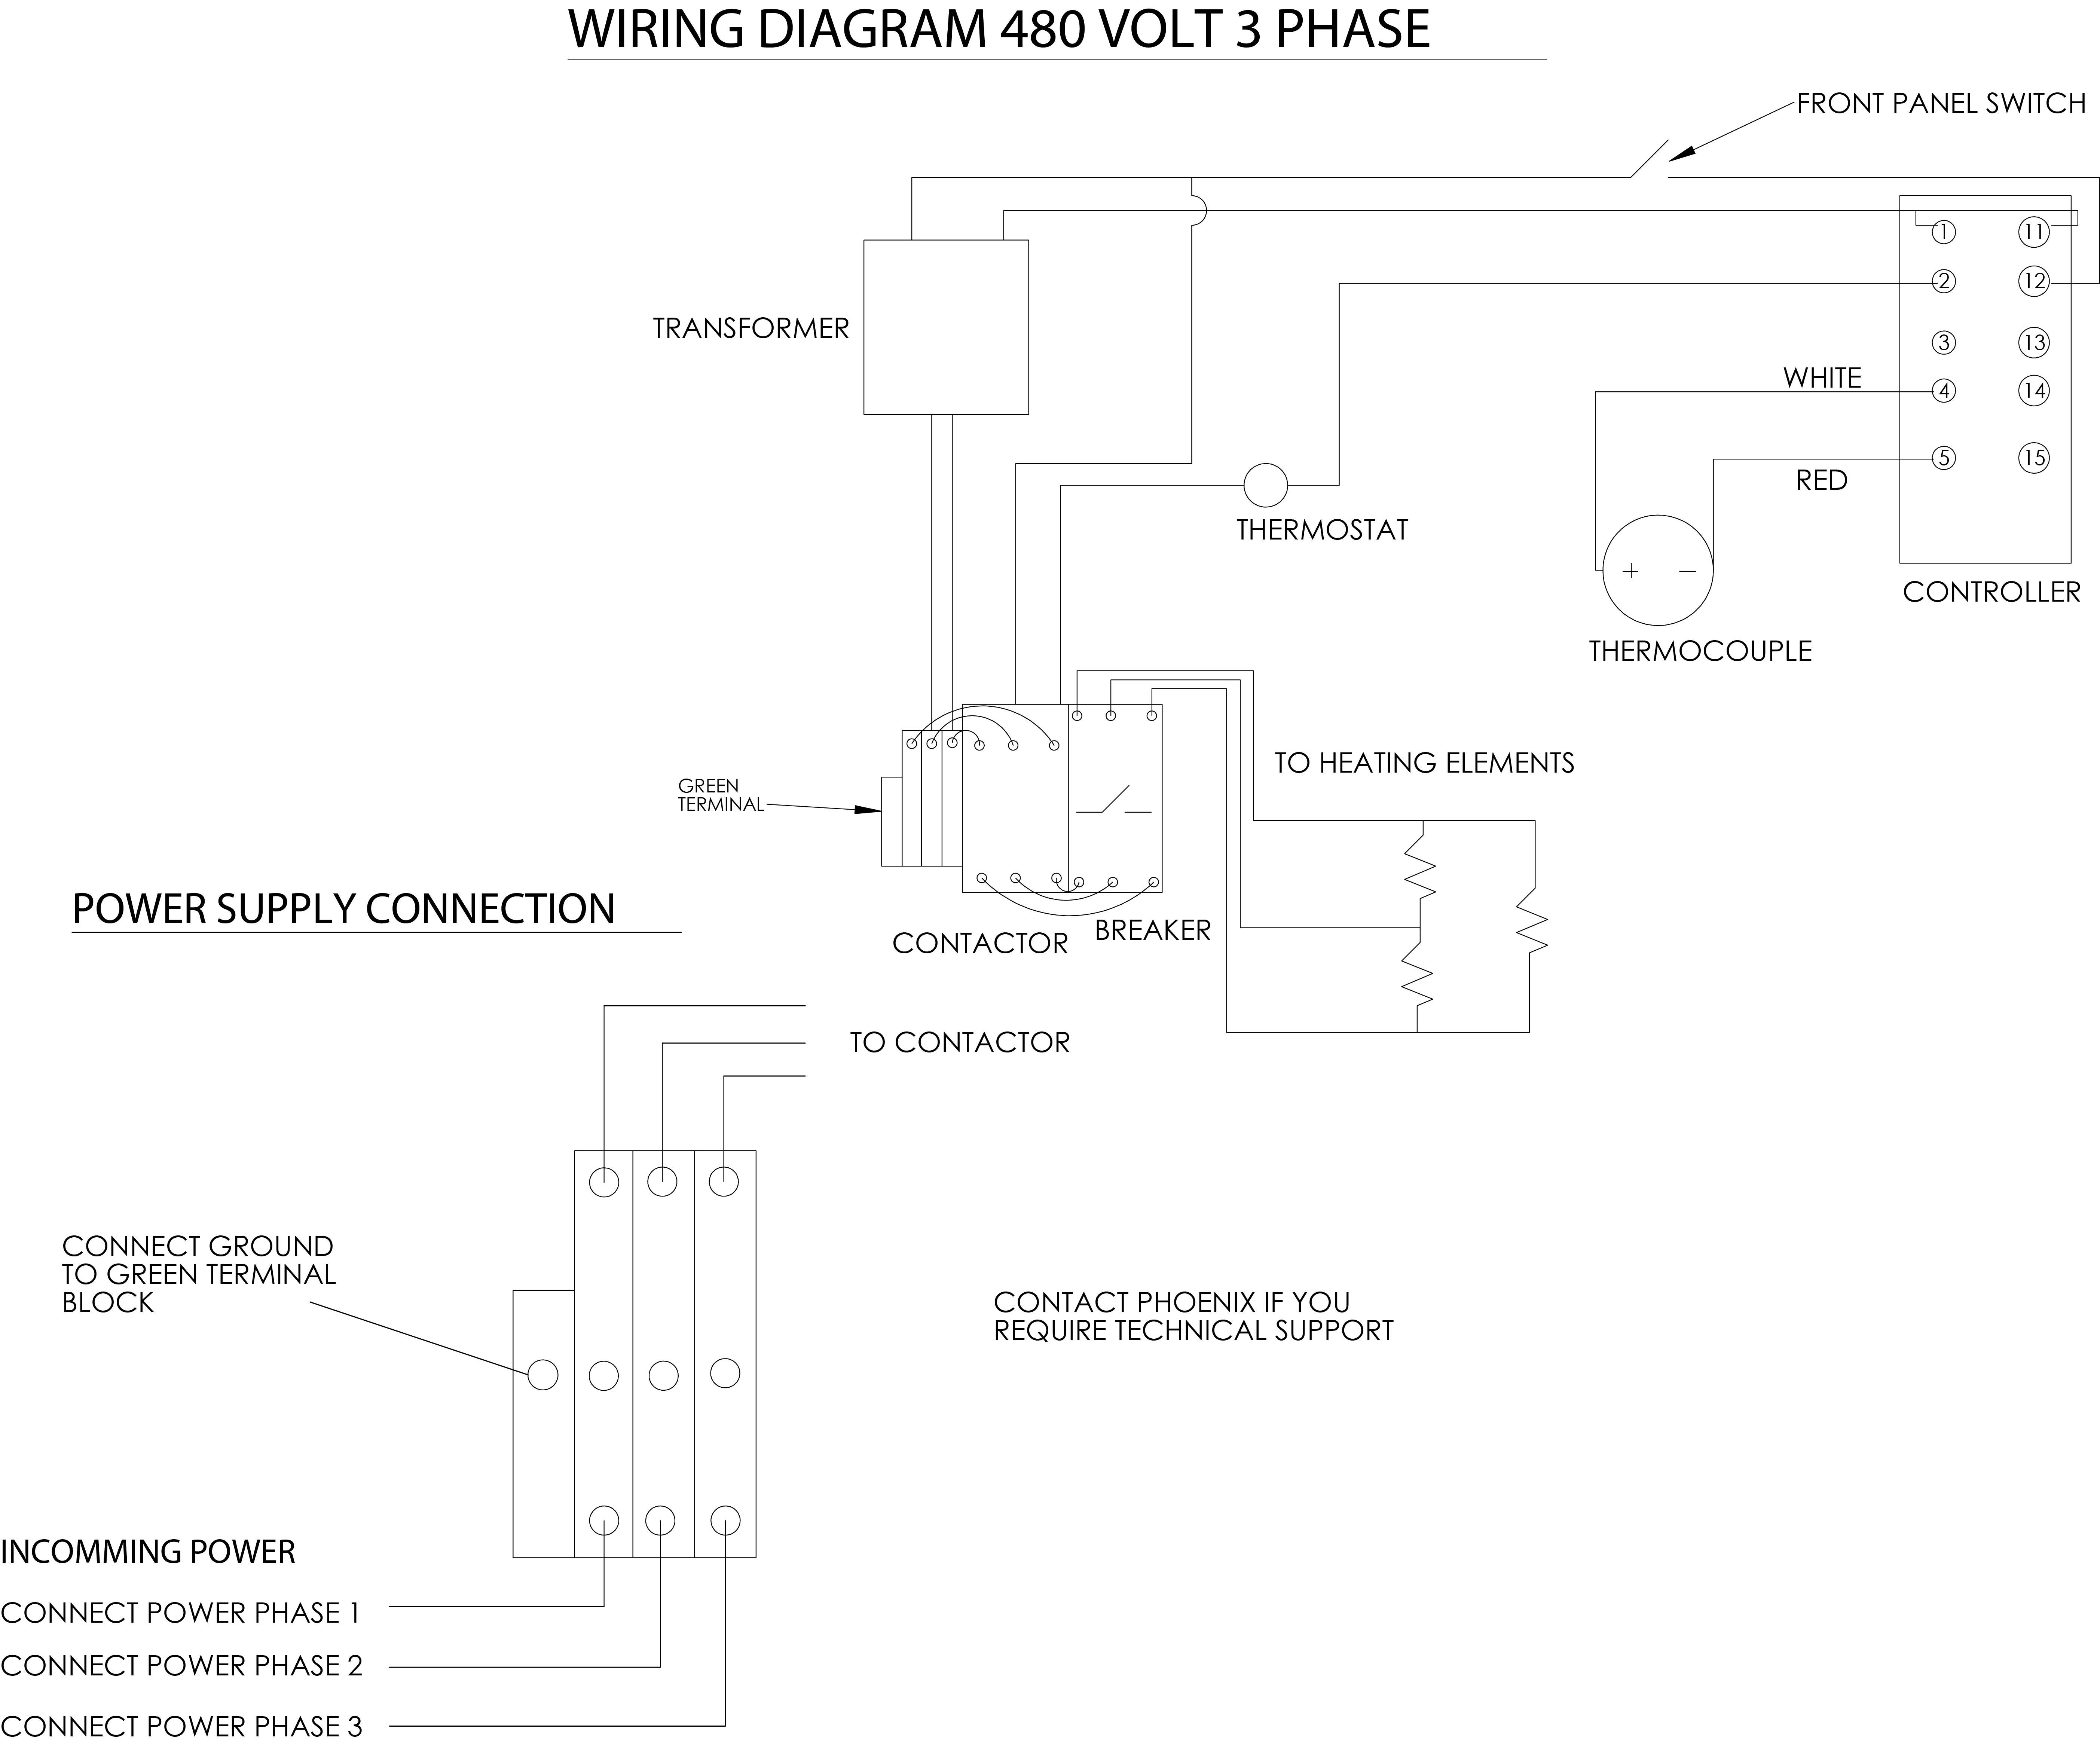 3 phase transformer wiring diagram oil axxess type 40ht bench rod ovens phoenix international